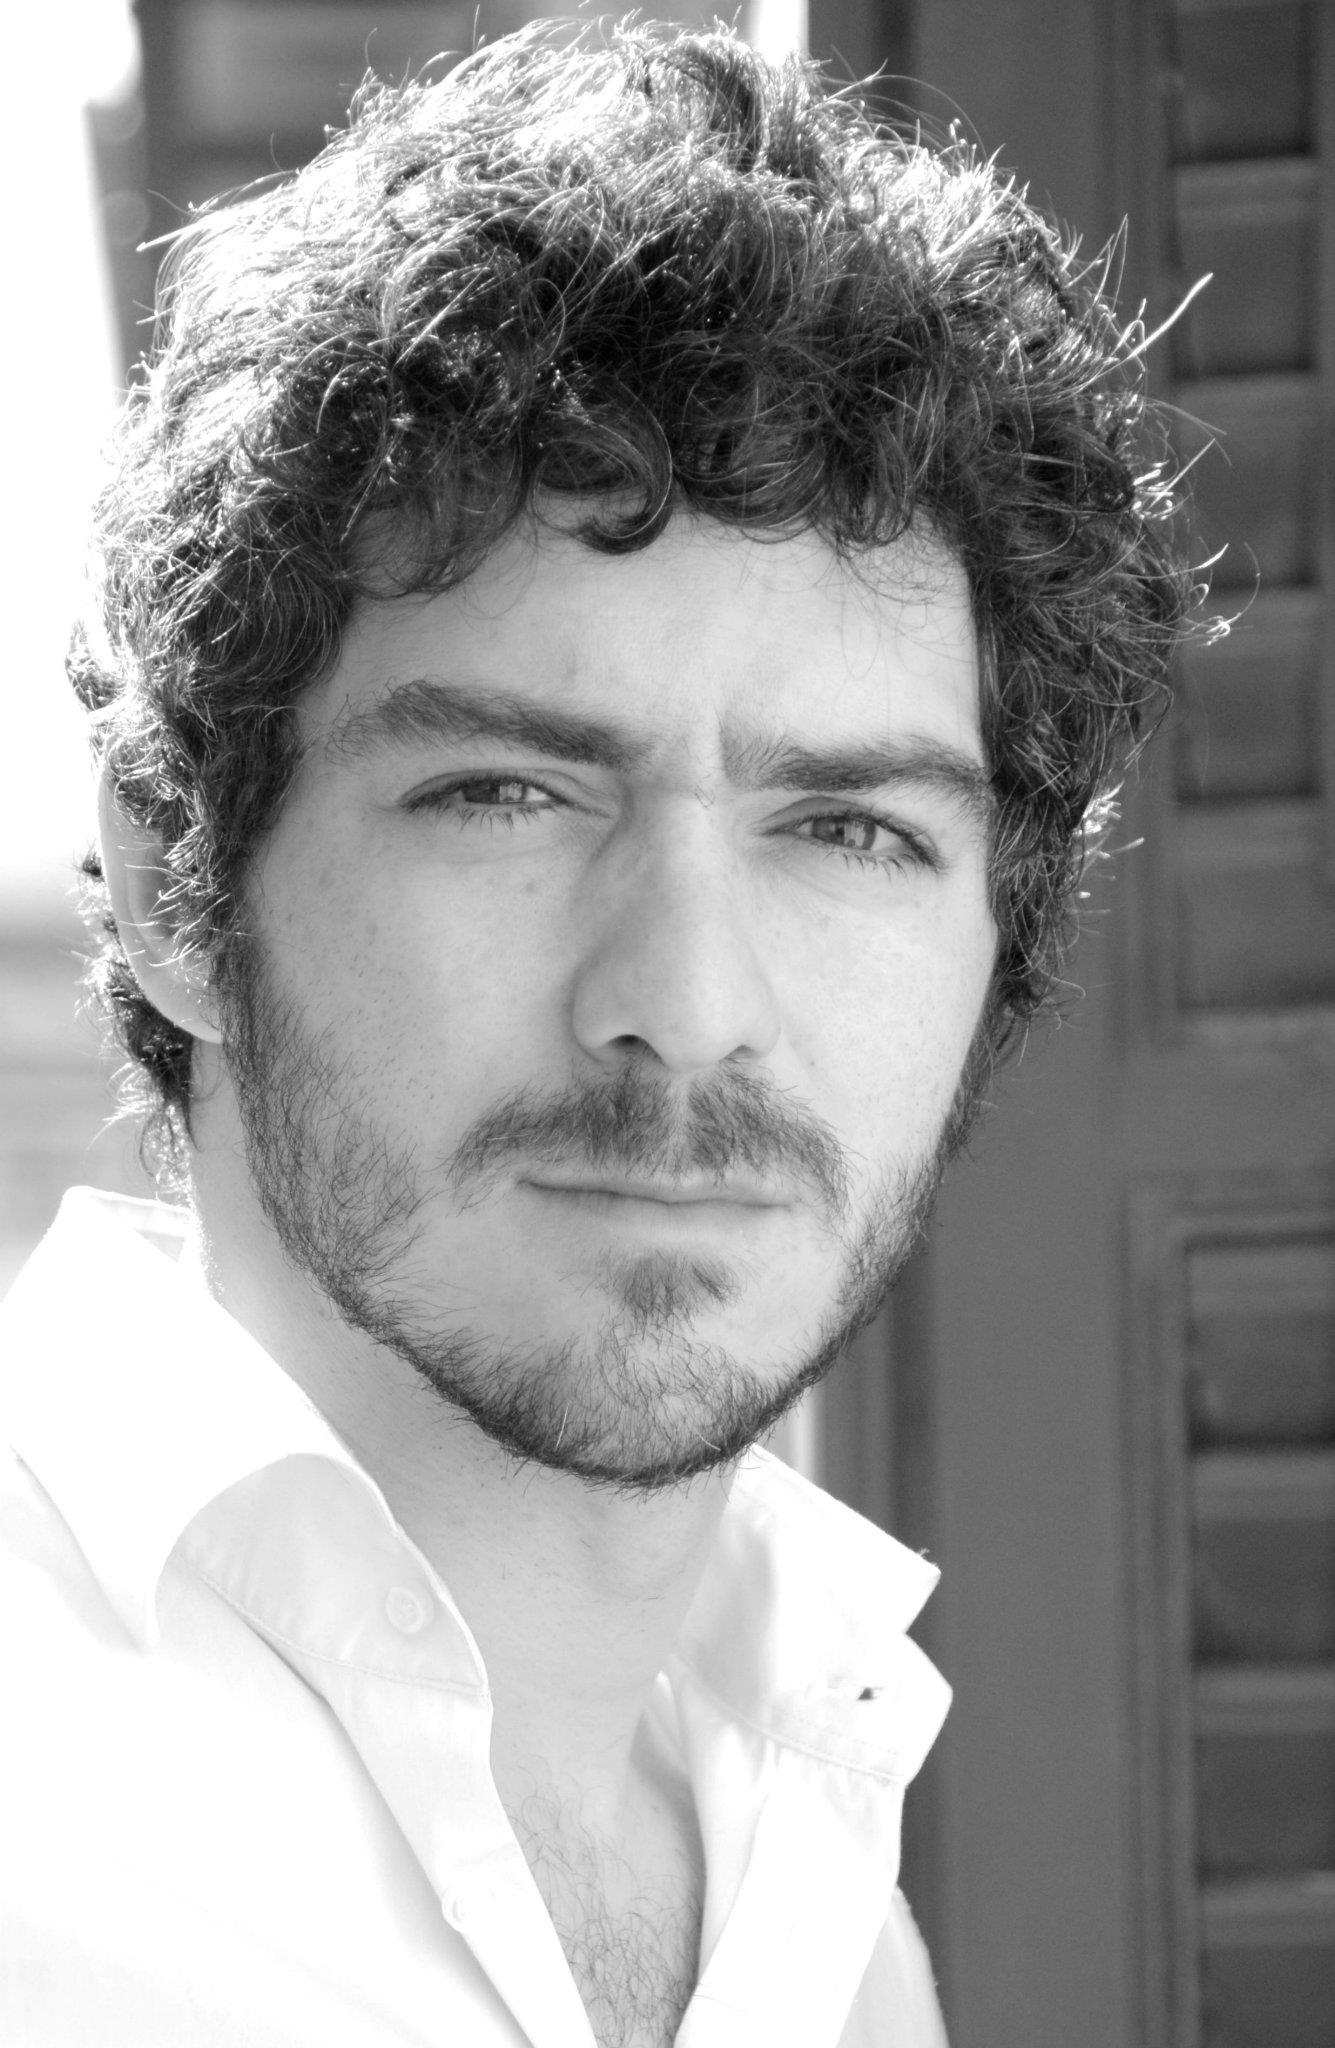 Carlos Jimenez-Alfaro